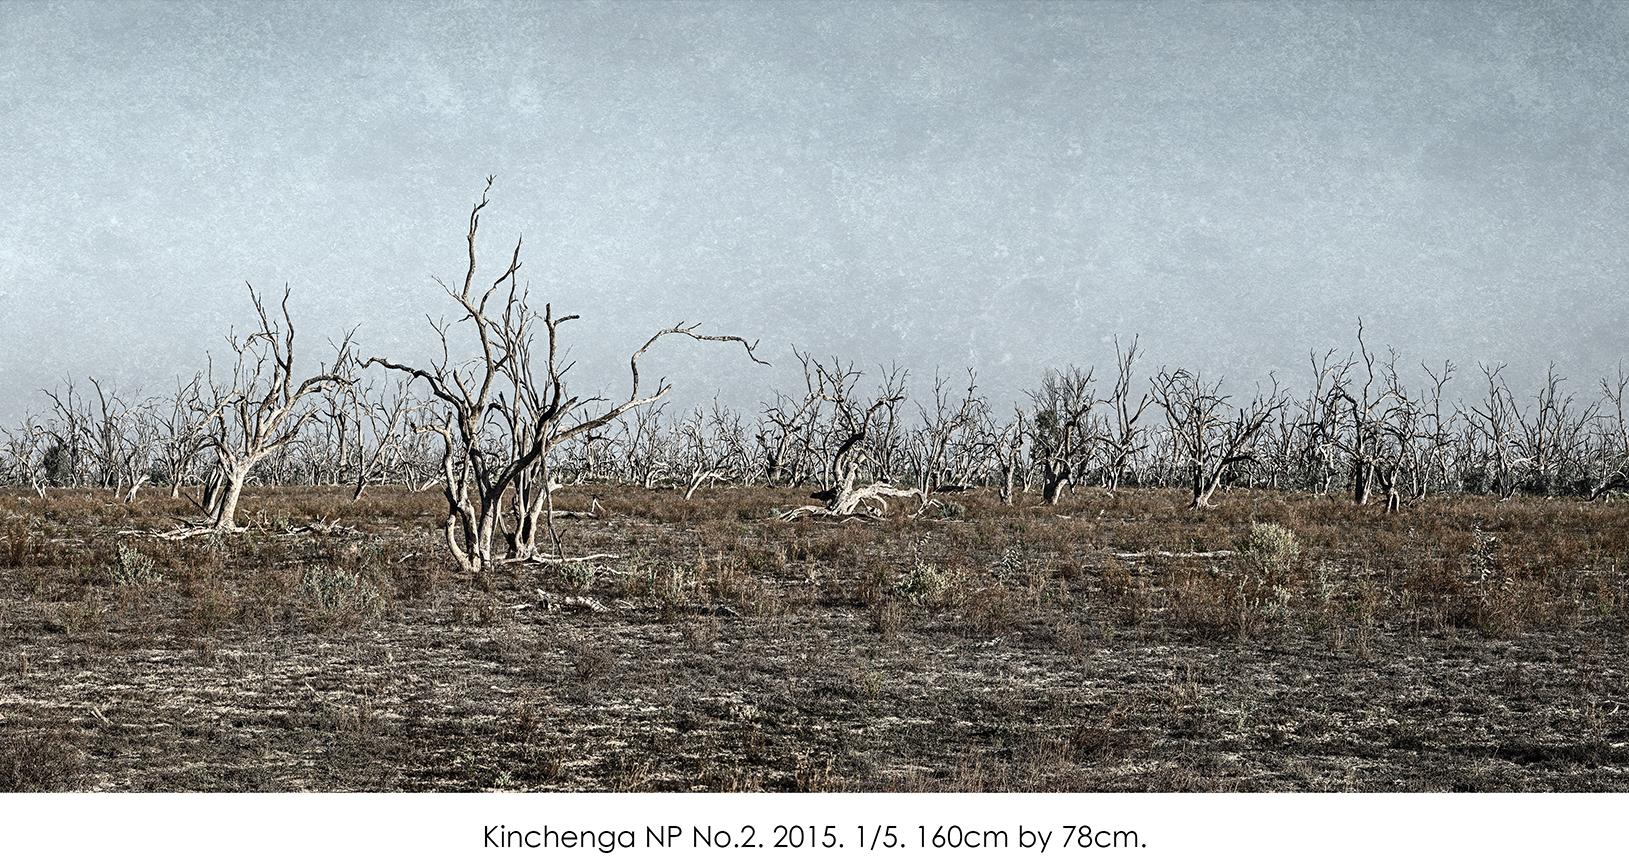 Kinchenga NP No.2.jpg